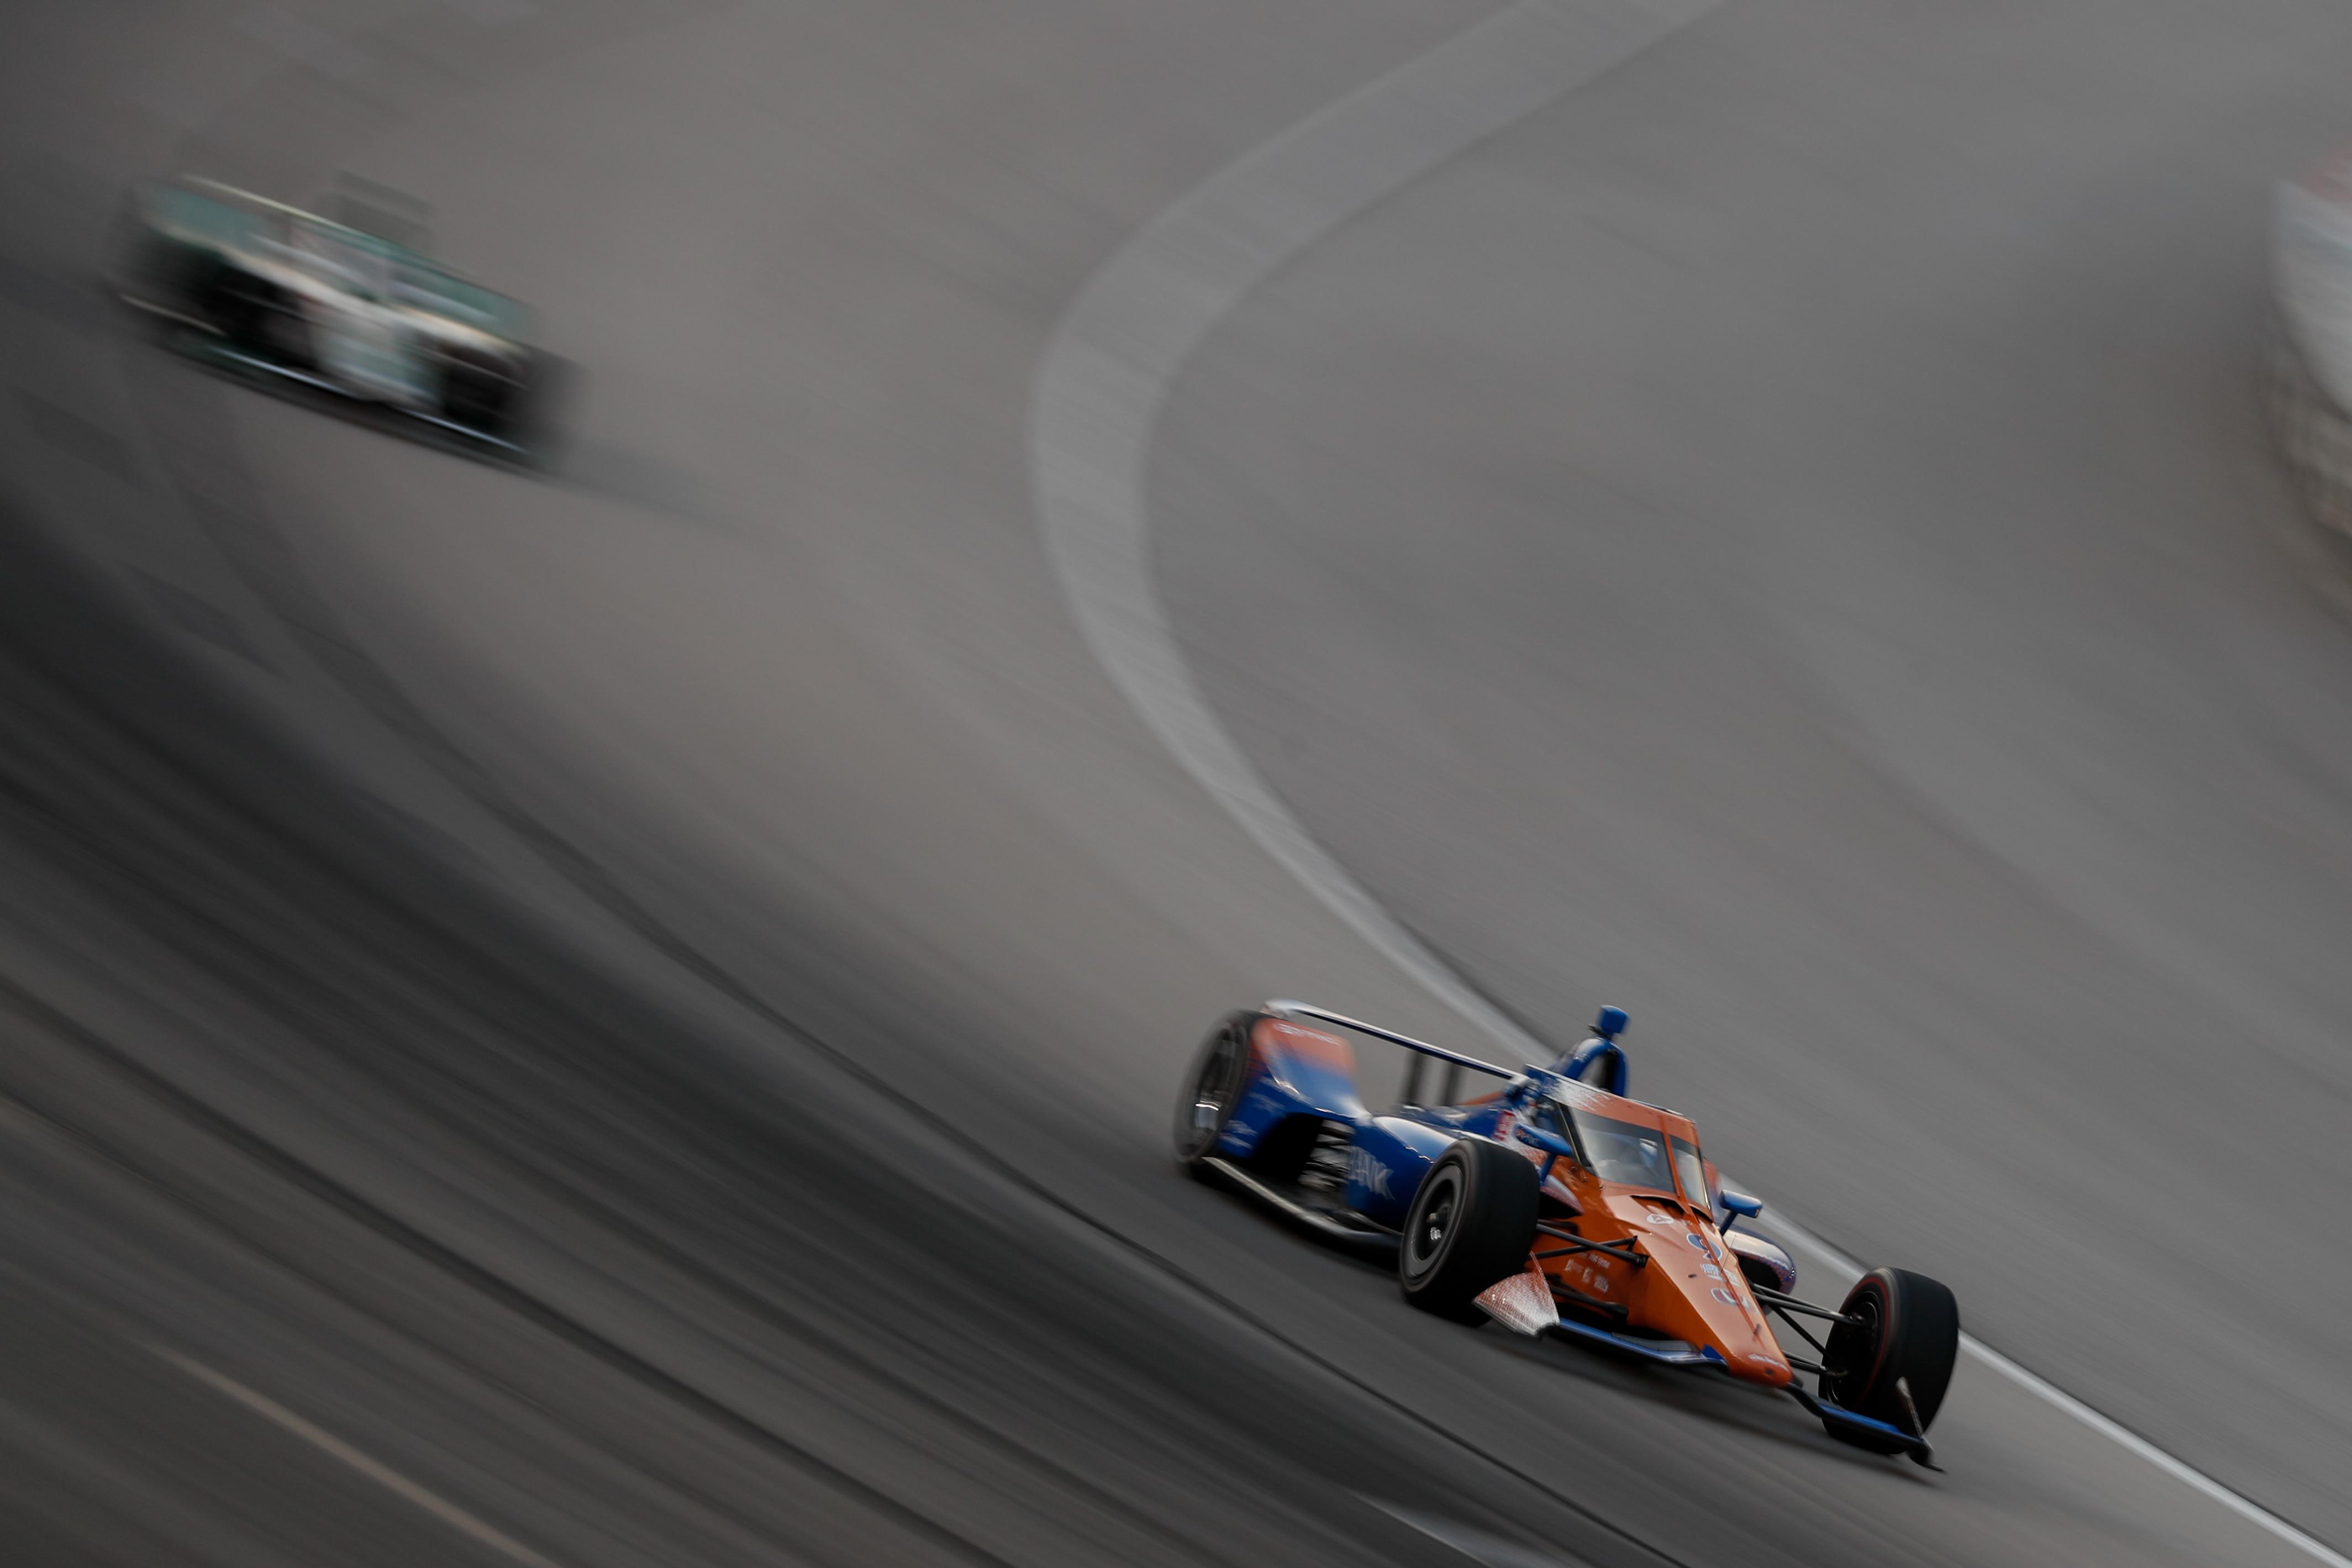 Scott Dixon Chip Ganassi IndyCar Texas 2020